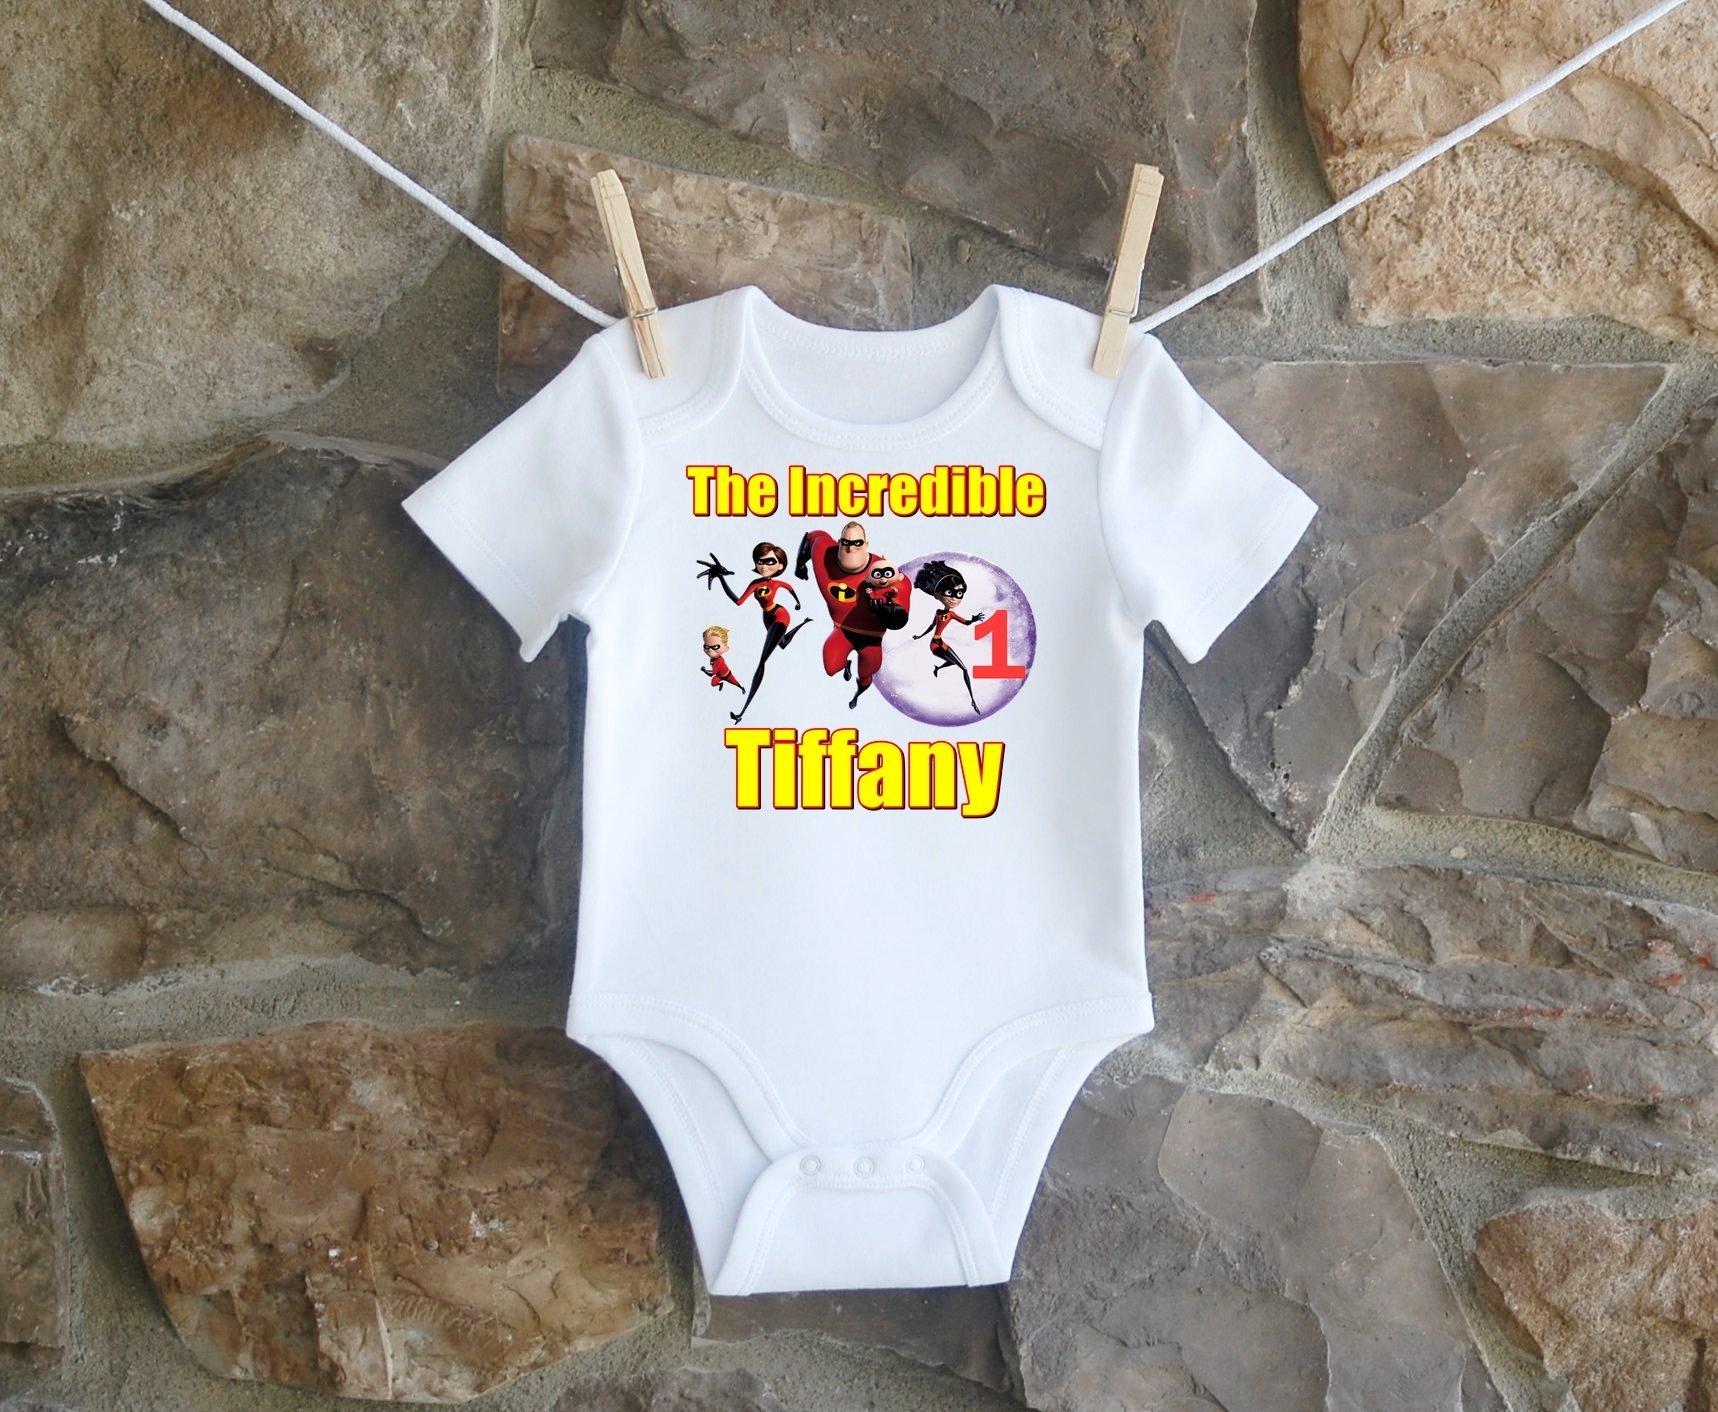 The Incredibles Birthday Shirt, The Incredibles Birthday Shirt For Girls, Personalized Girls Incredibles Birthday Shirt, Customized Incredibles Birthday Shirt